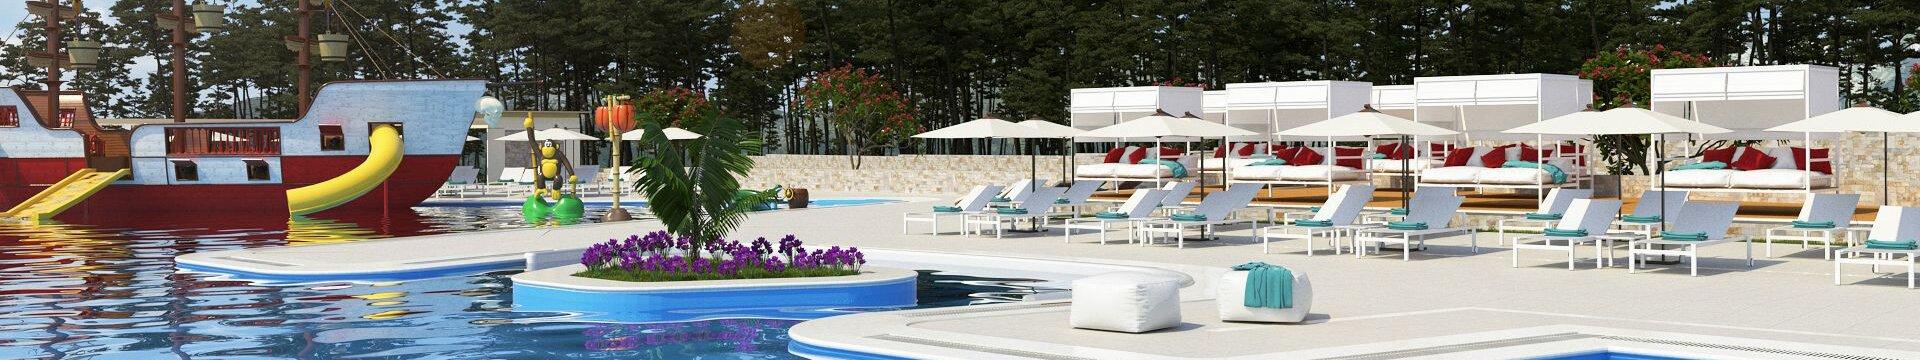 News in 2018. - Campsite Santa Marina| AdriaCamps